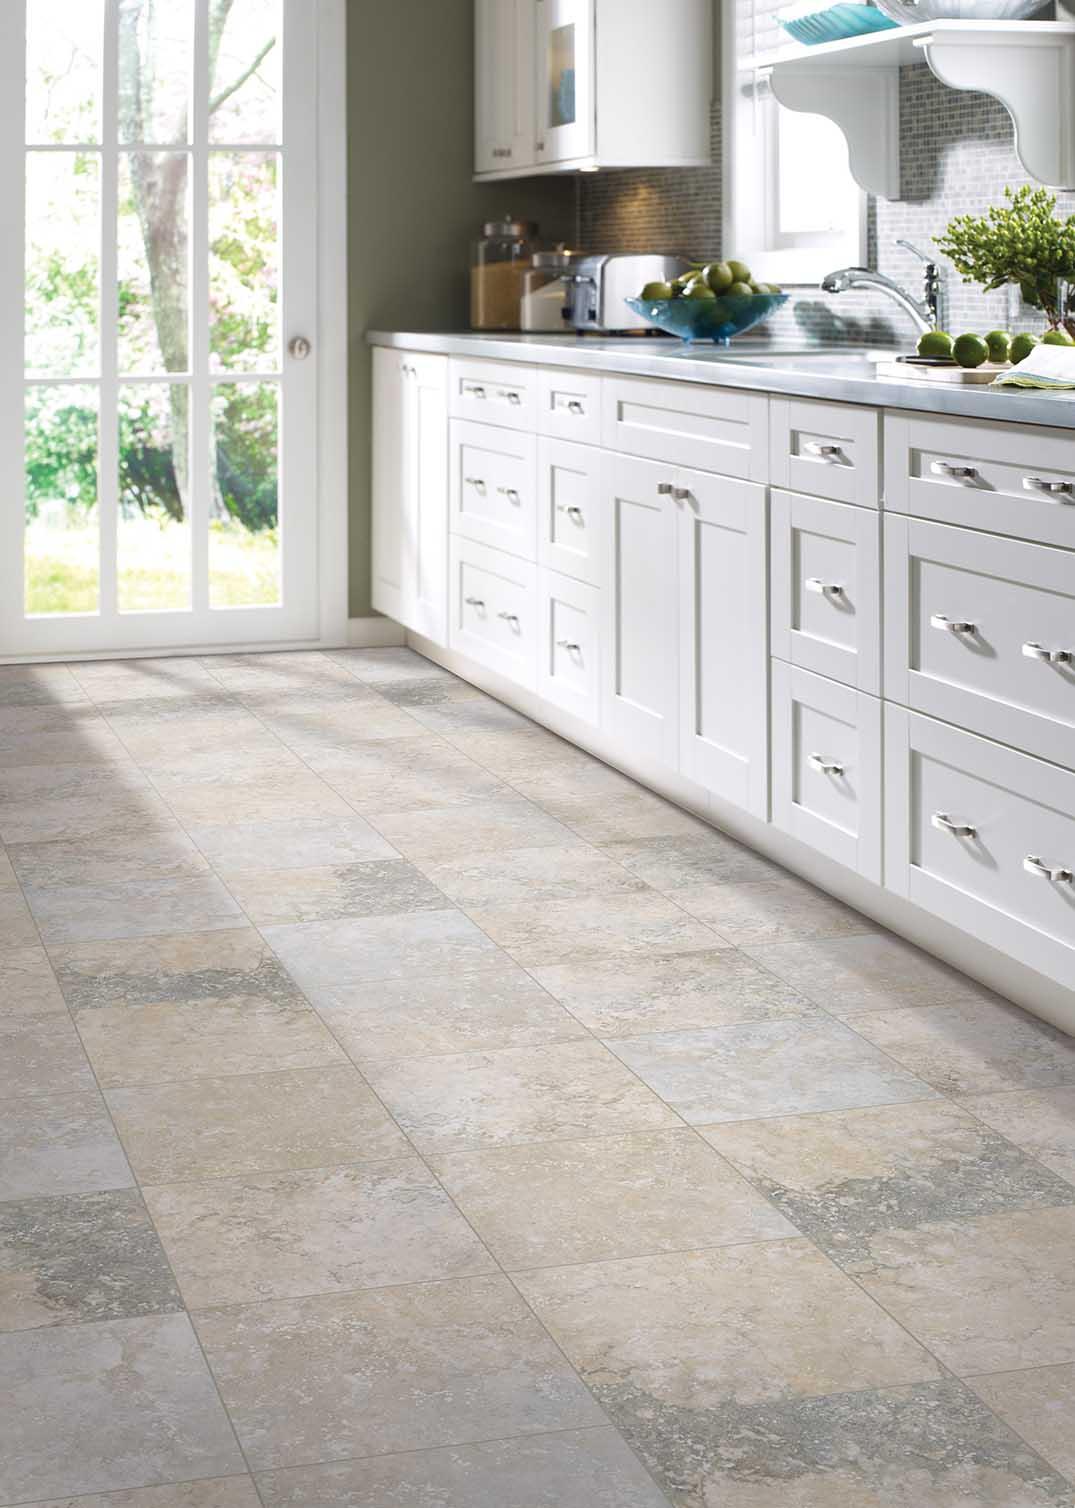 Tile universal beautiful natural patterns and design ceramic tile dailygadgetfo Choice Image